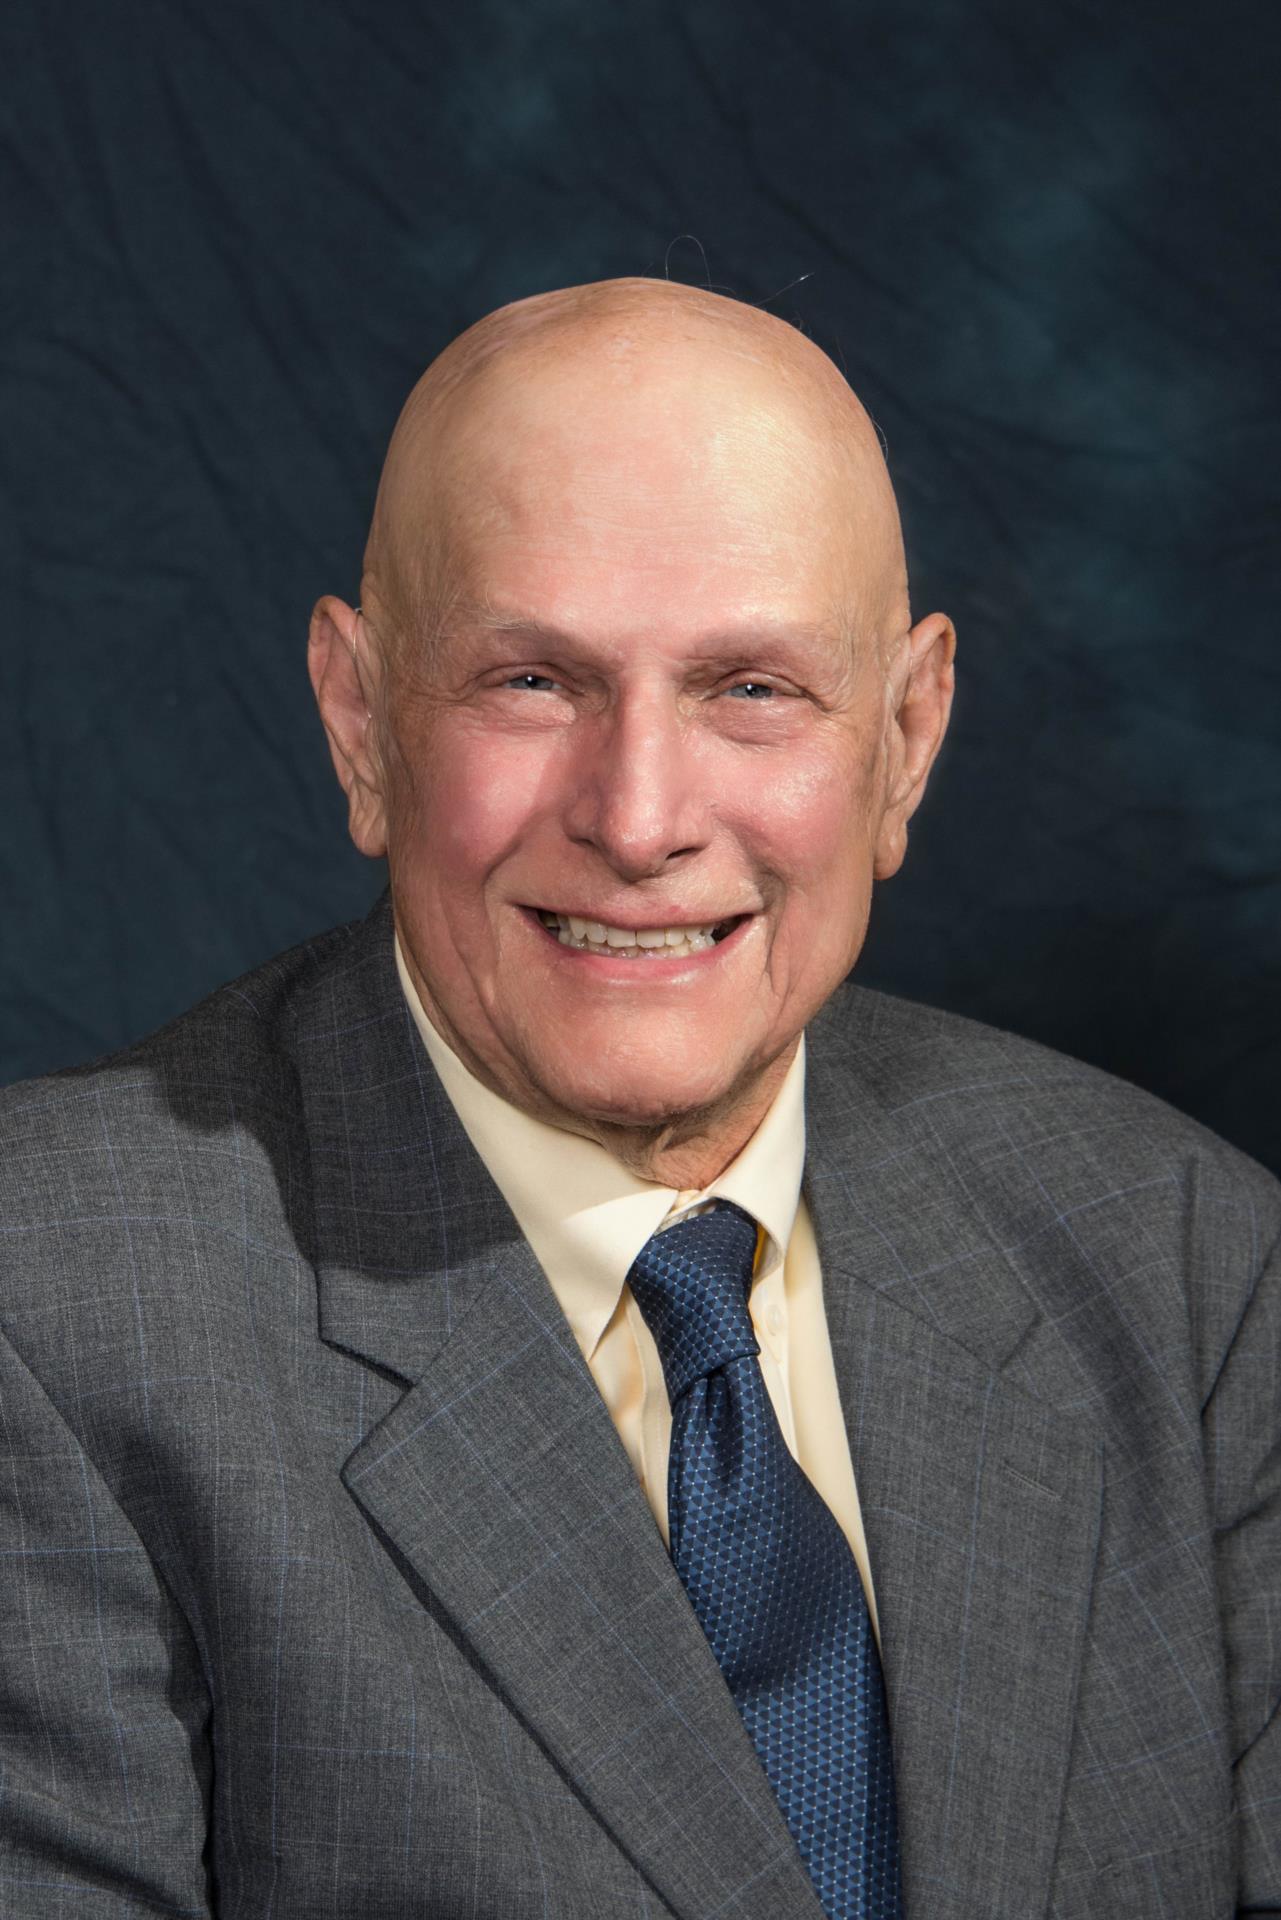 R. Charles Phillips